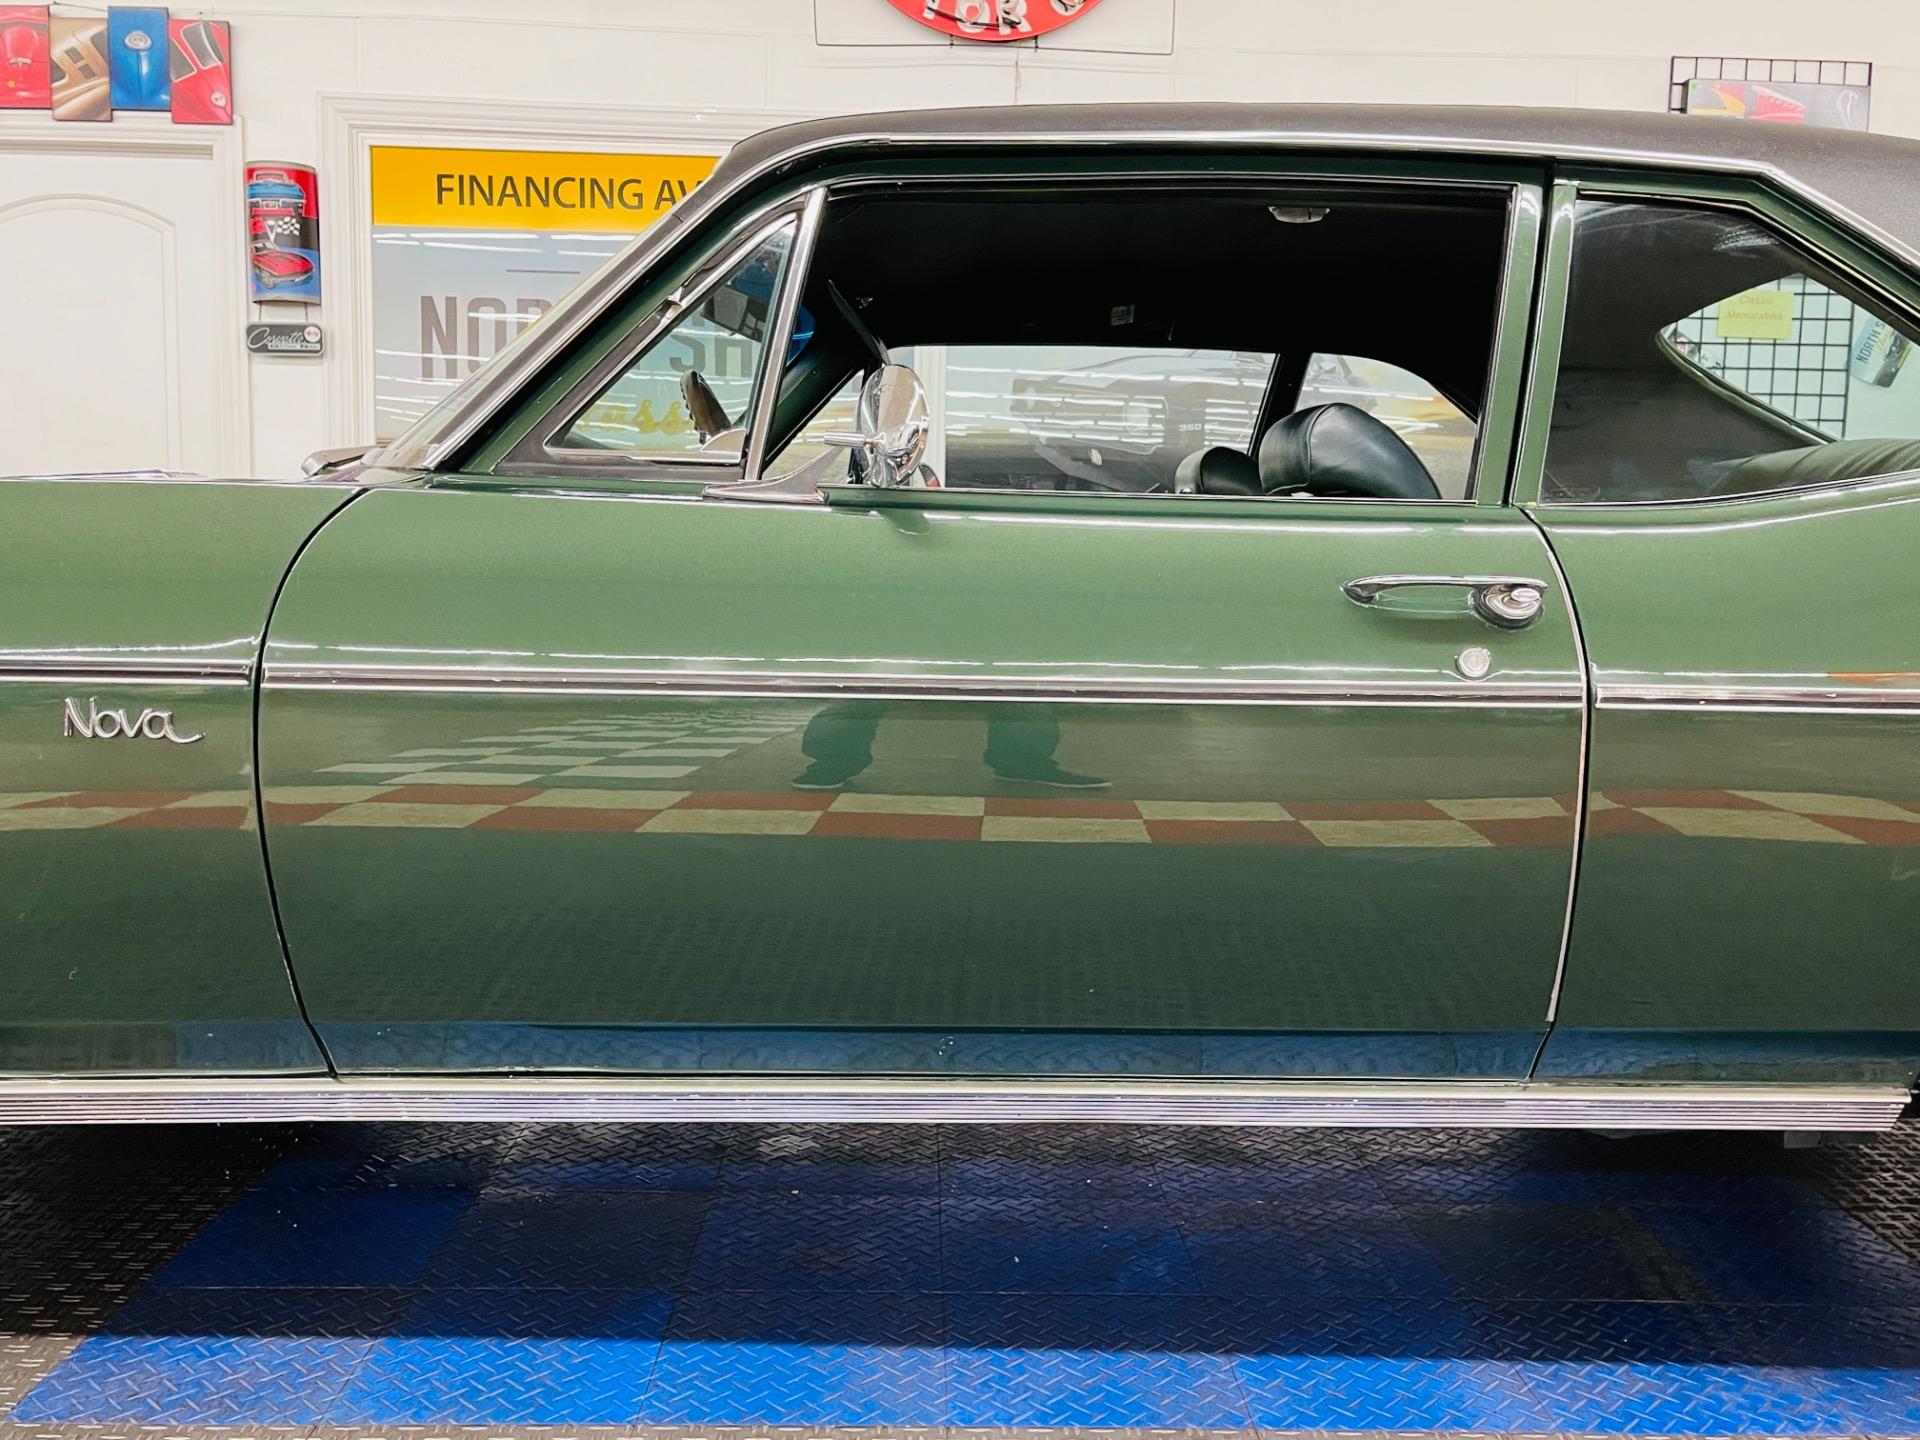 Used 1972 Chevrolet Nova - 396 BBC ENGINE - 4 SPEED MANUAL TRANS - SEE VIDEO | Mundelein, IL